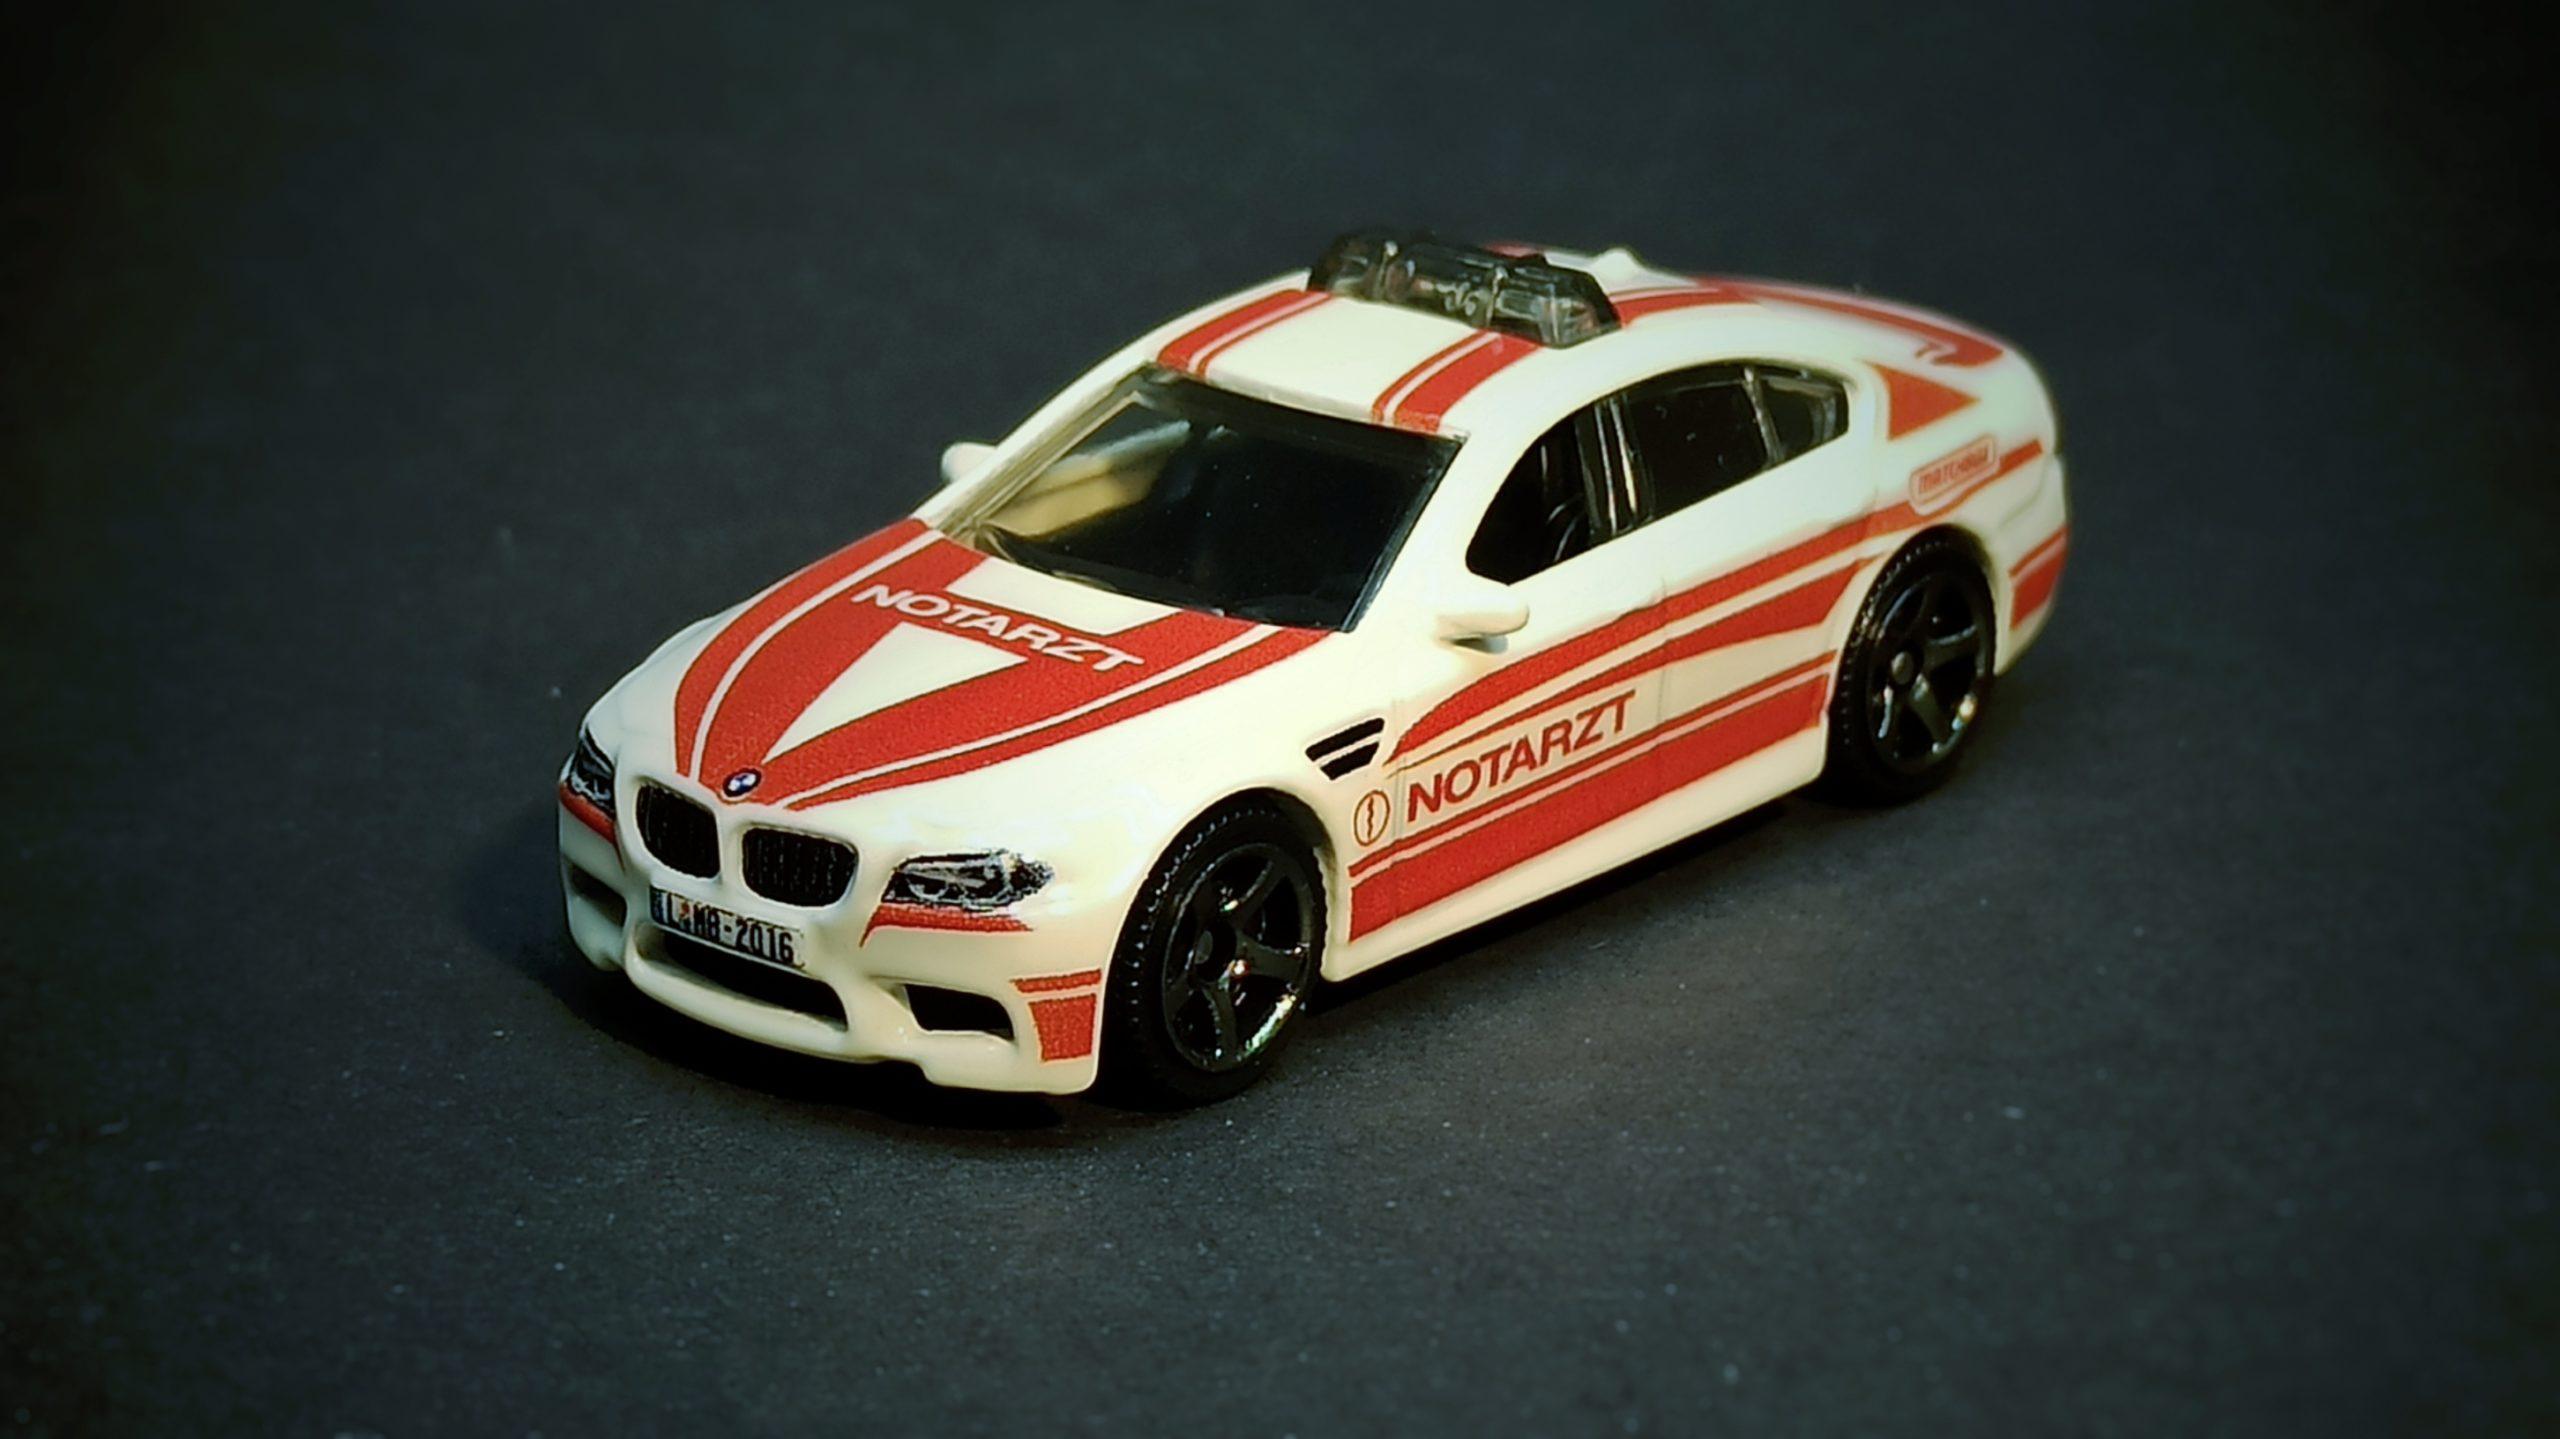 "Matchbox BMW M5 Police 2016 Toy Fair ""Modell Hobby Spiel"" Leipzig white MBX Notarzt top angle"